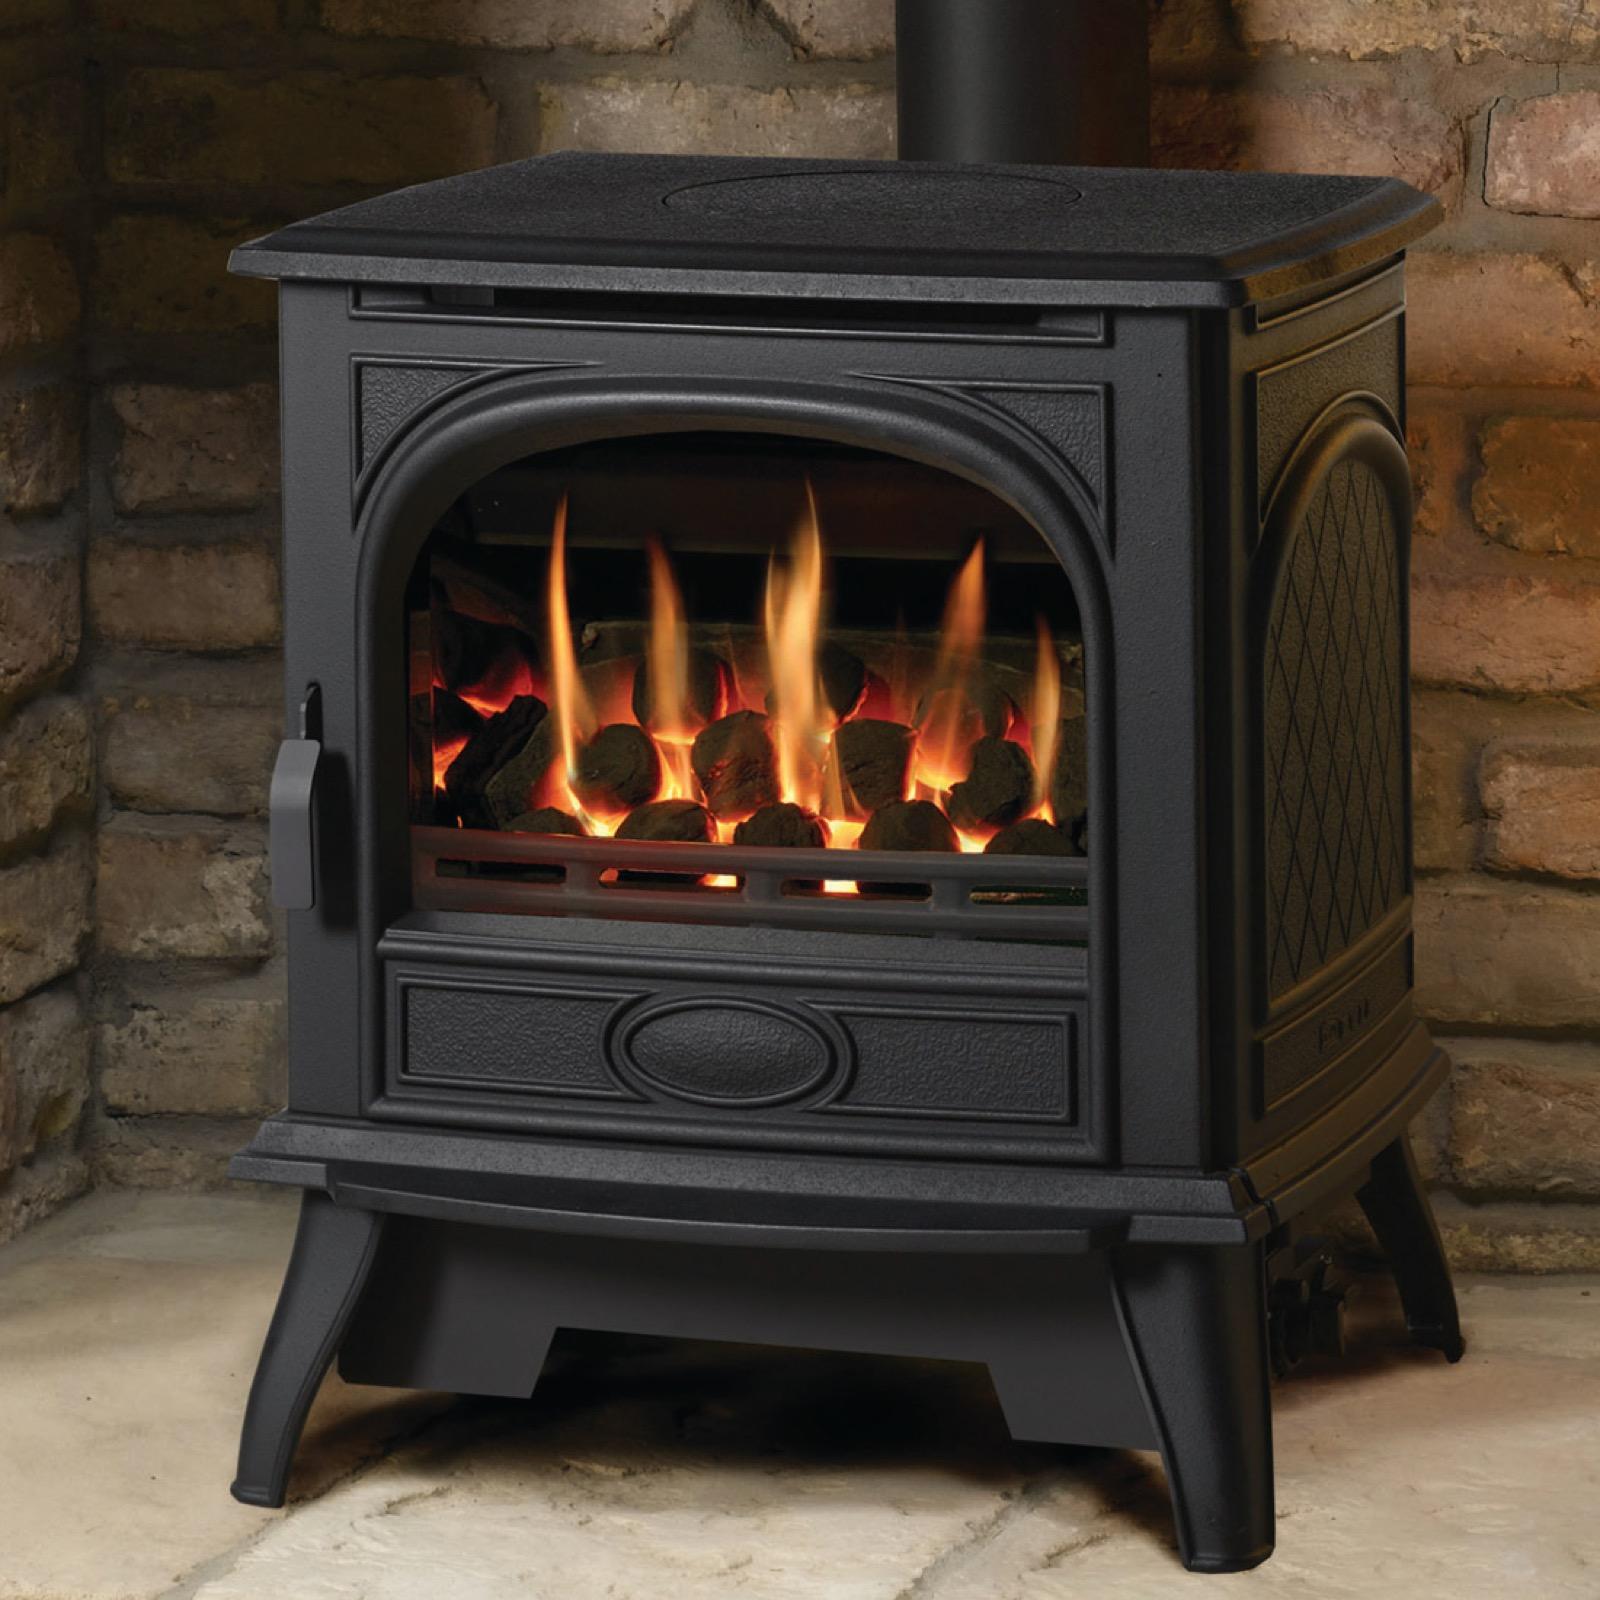 Natural Gas Stoves And Carbon Monoxide